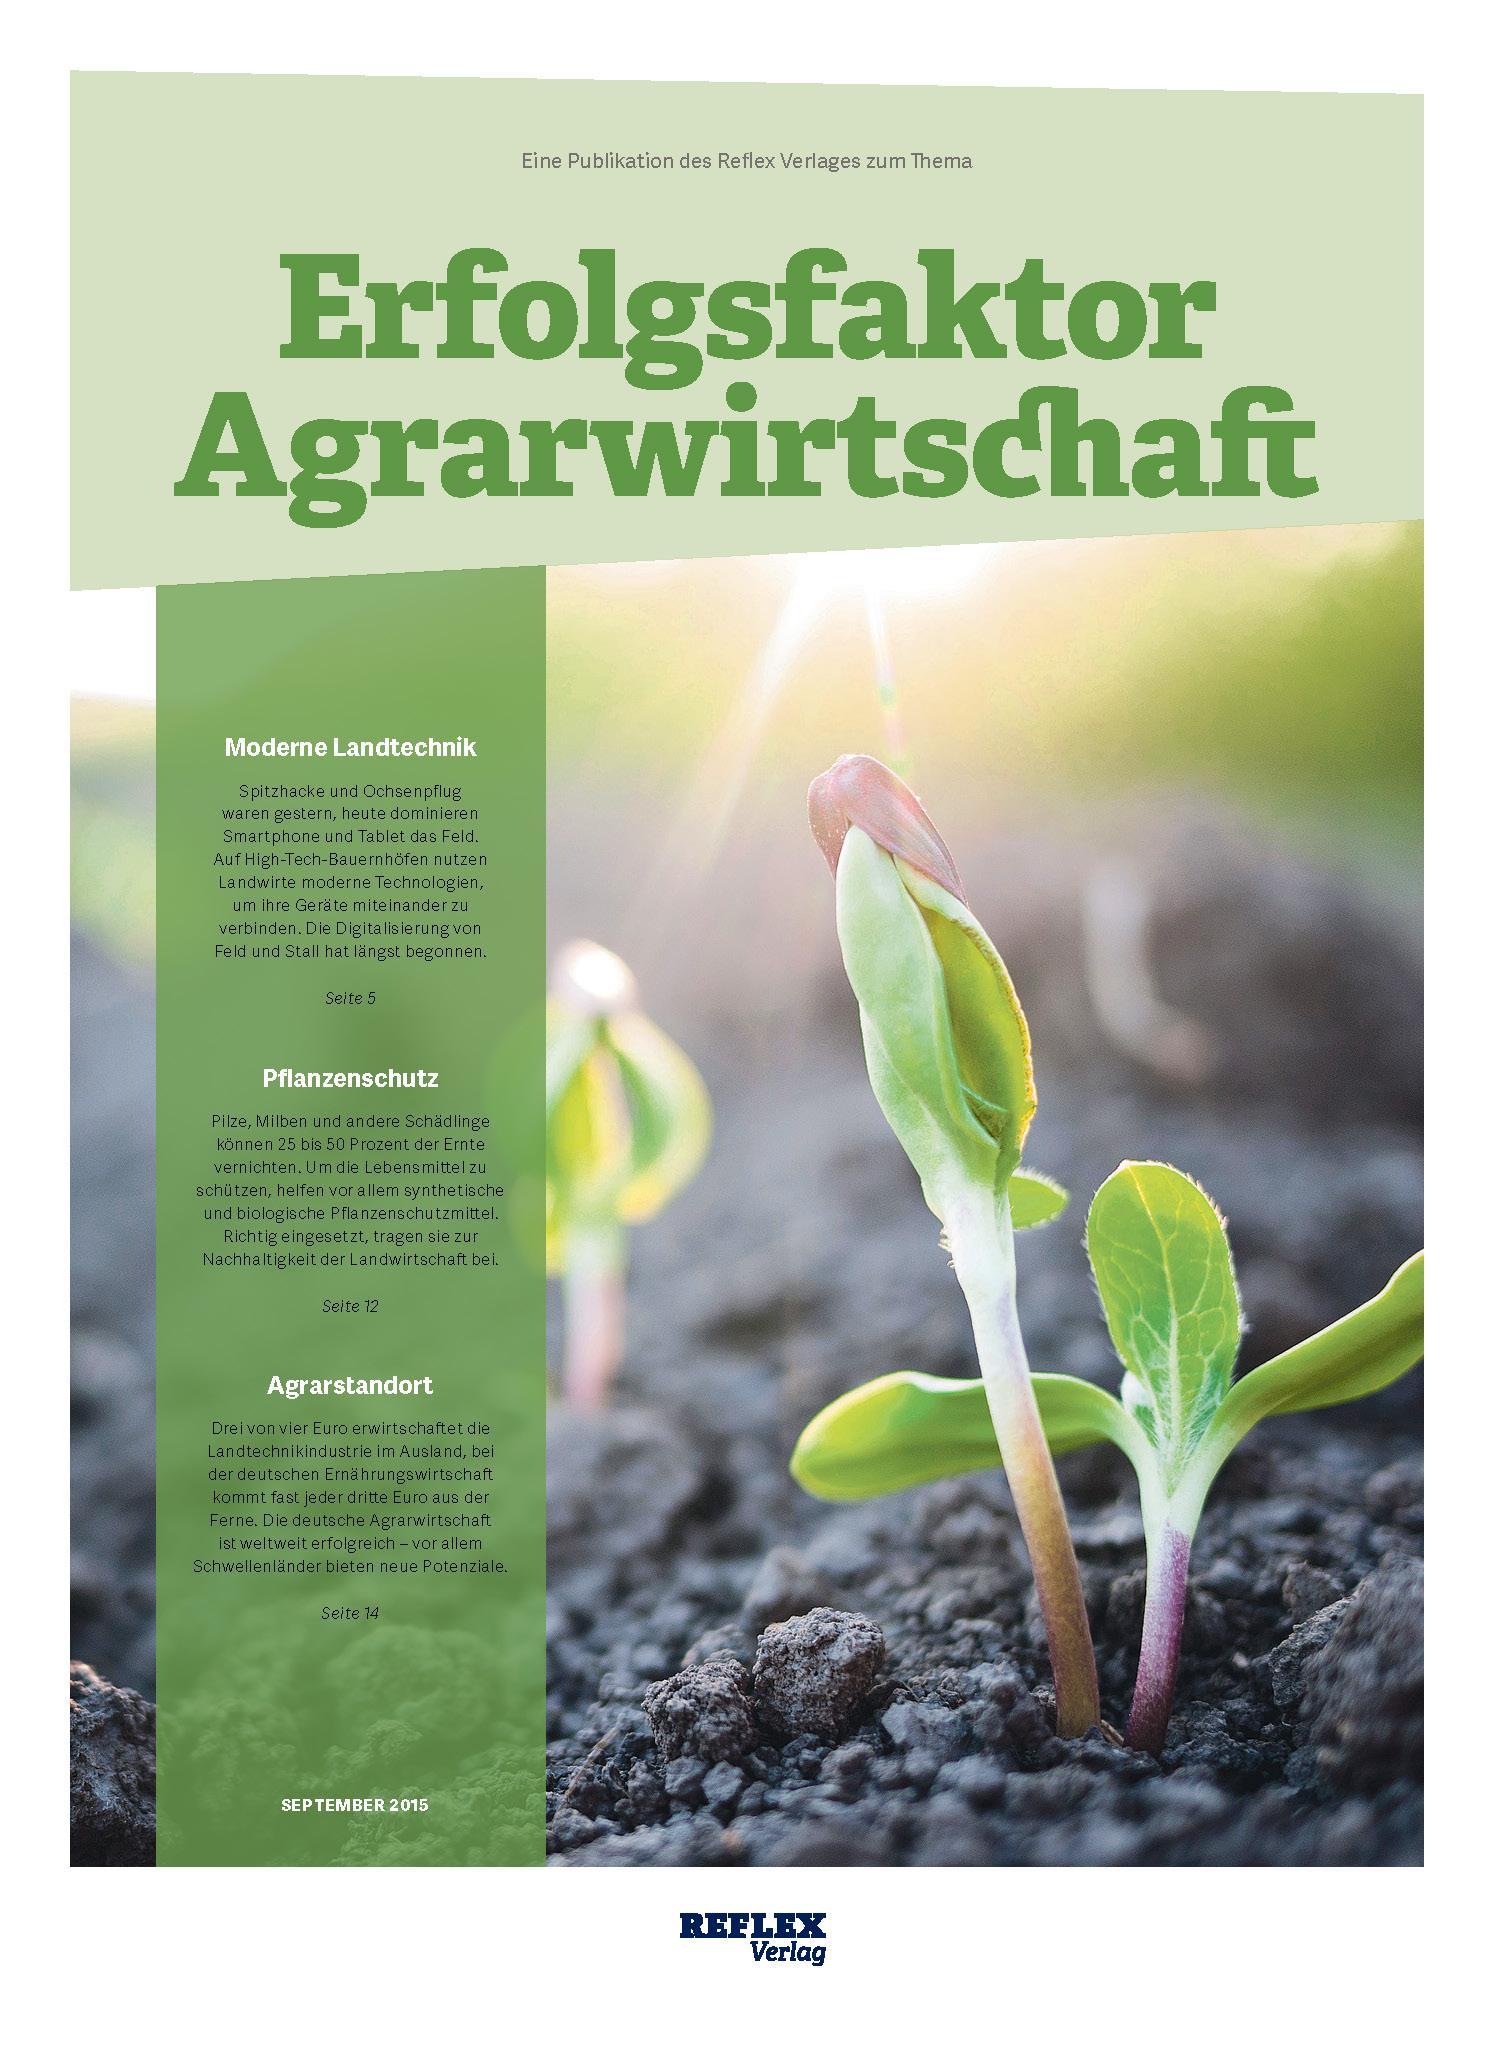 Reflex Verlag | Erfolgsfaktor Agrarwirtschaft